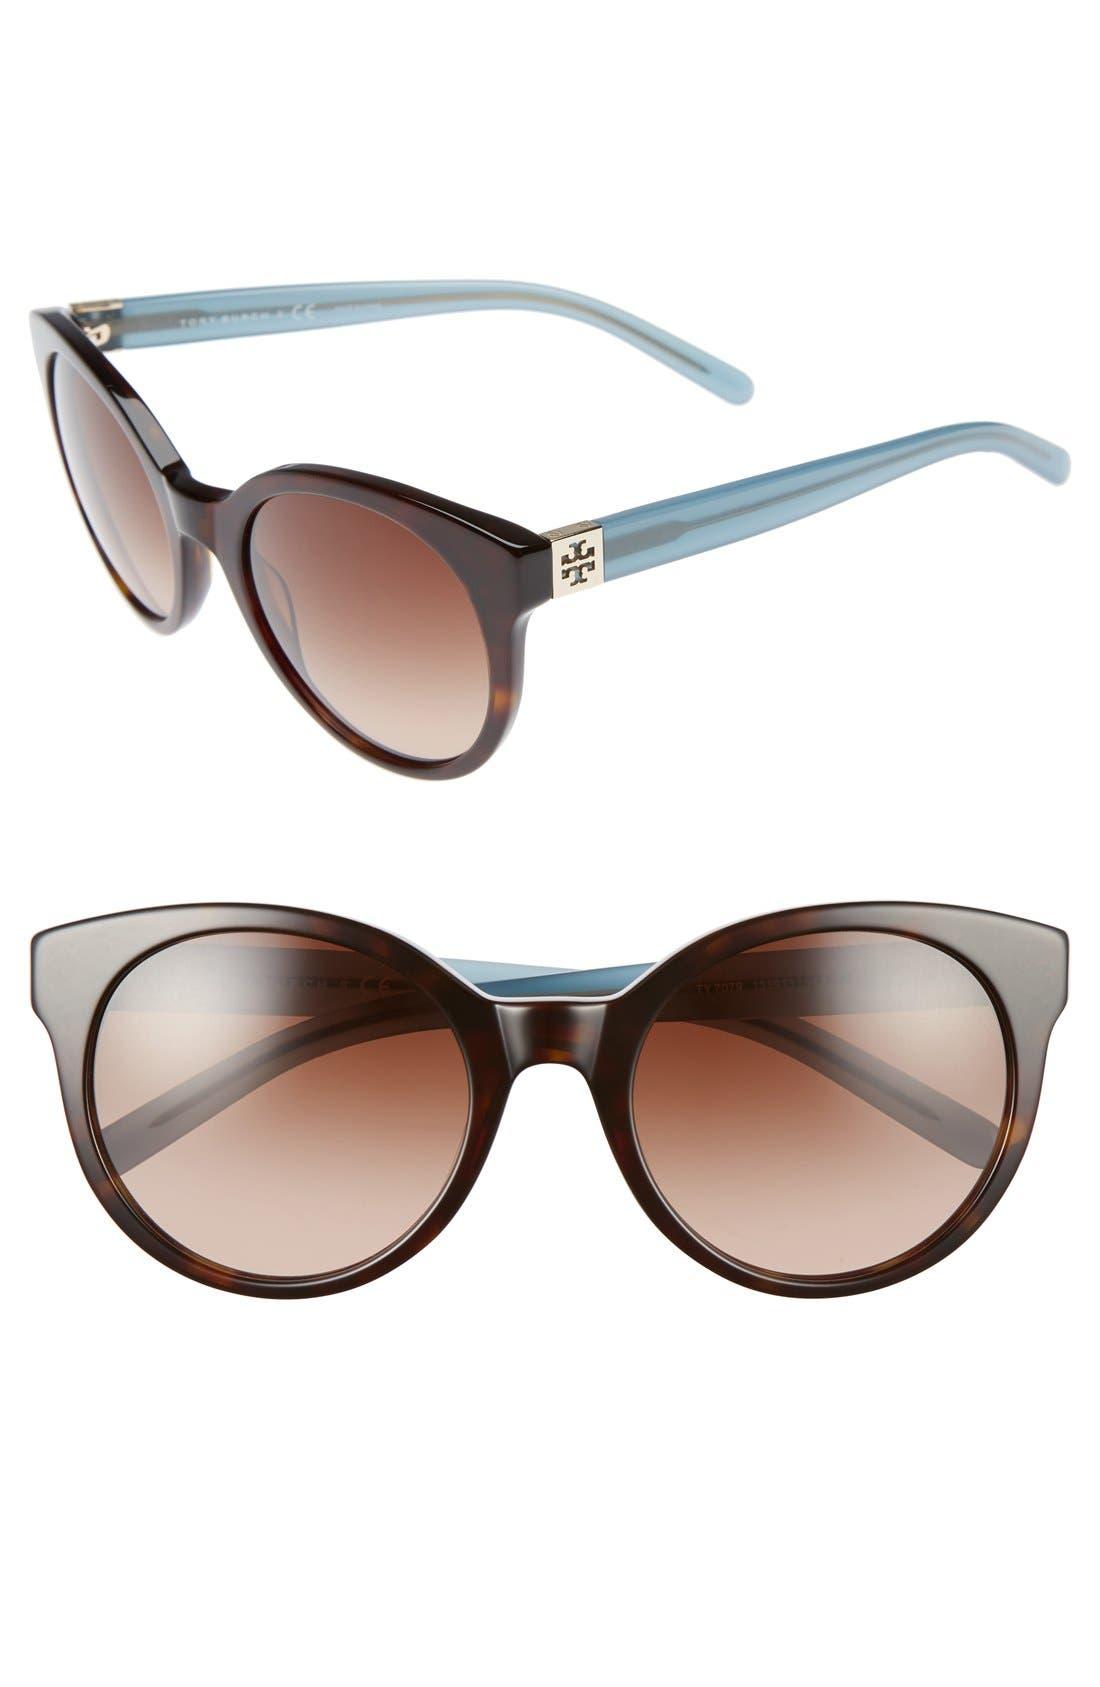 Tory Burch 'Stacked' 54mm Retro Sunglasses